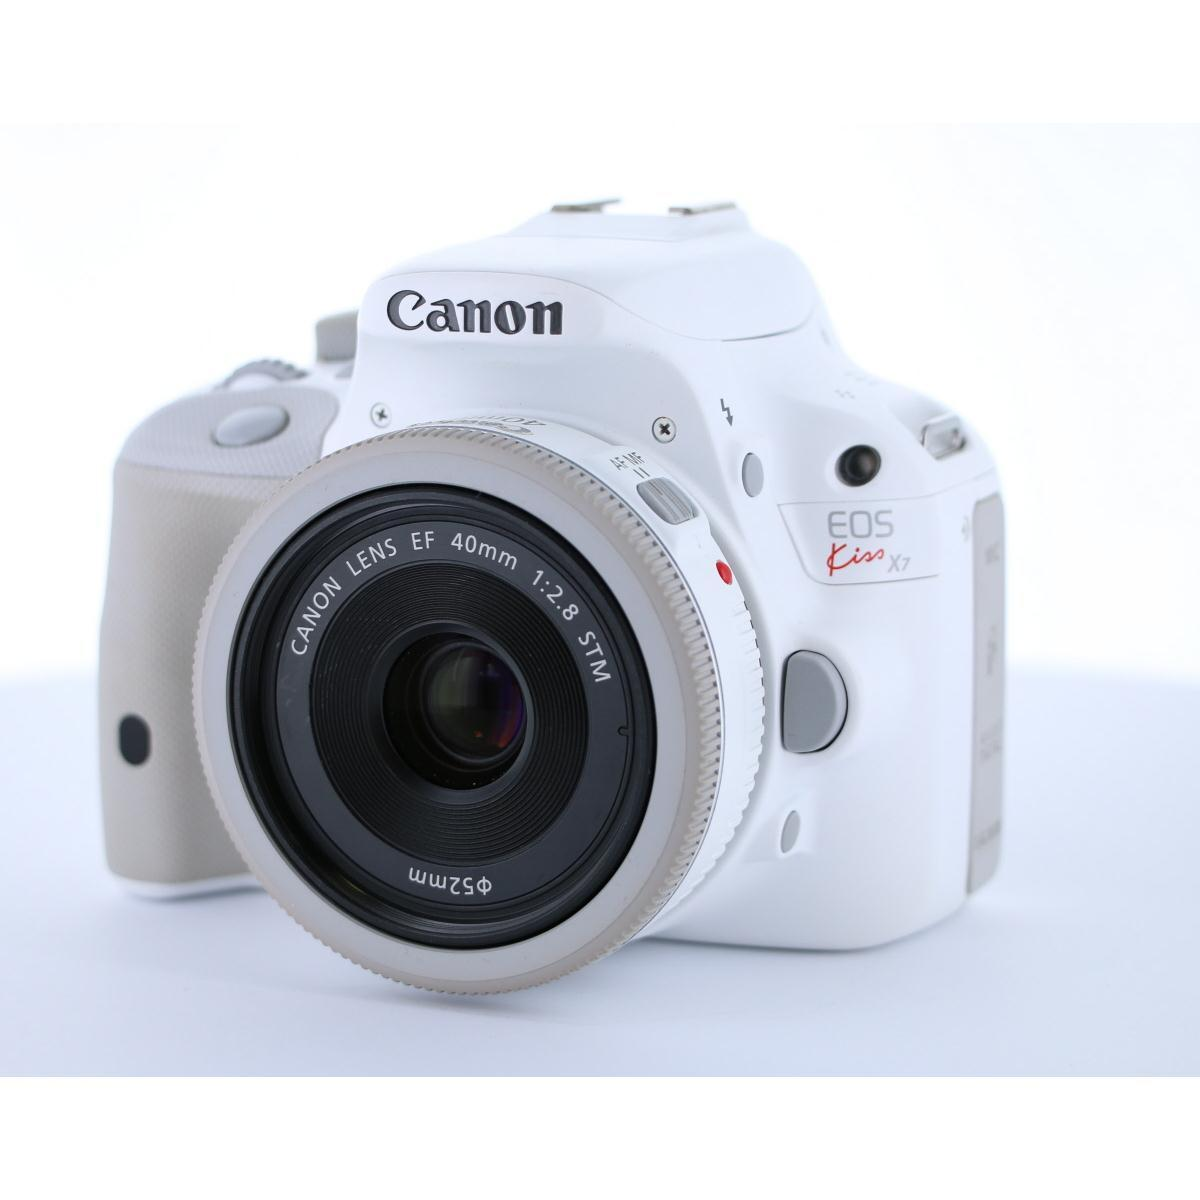 CANON KISS X7 WHITE 40mm F2.8KIT【中古】